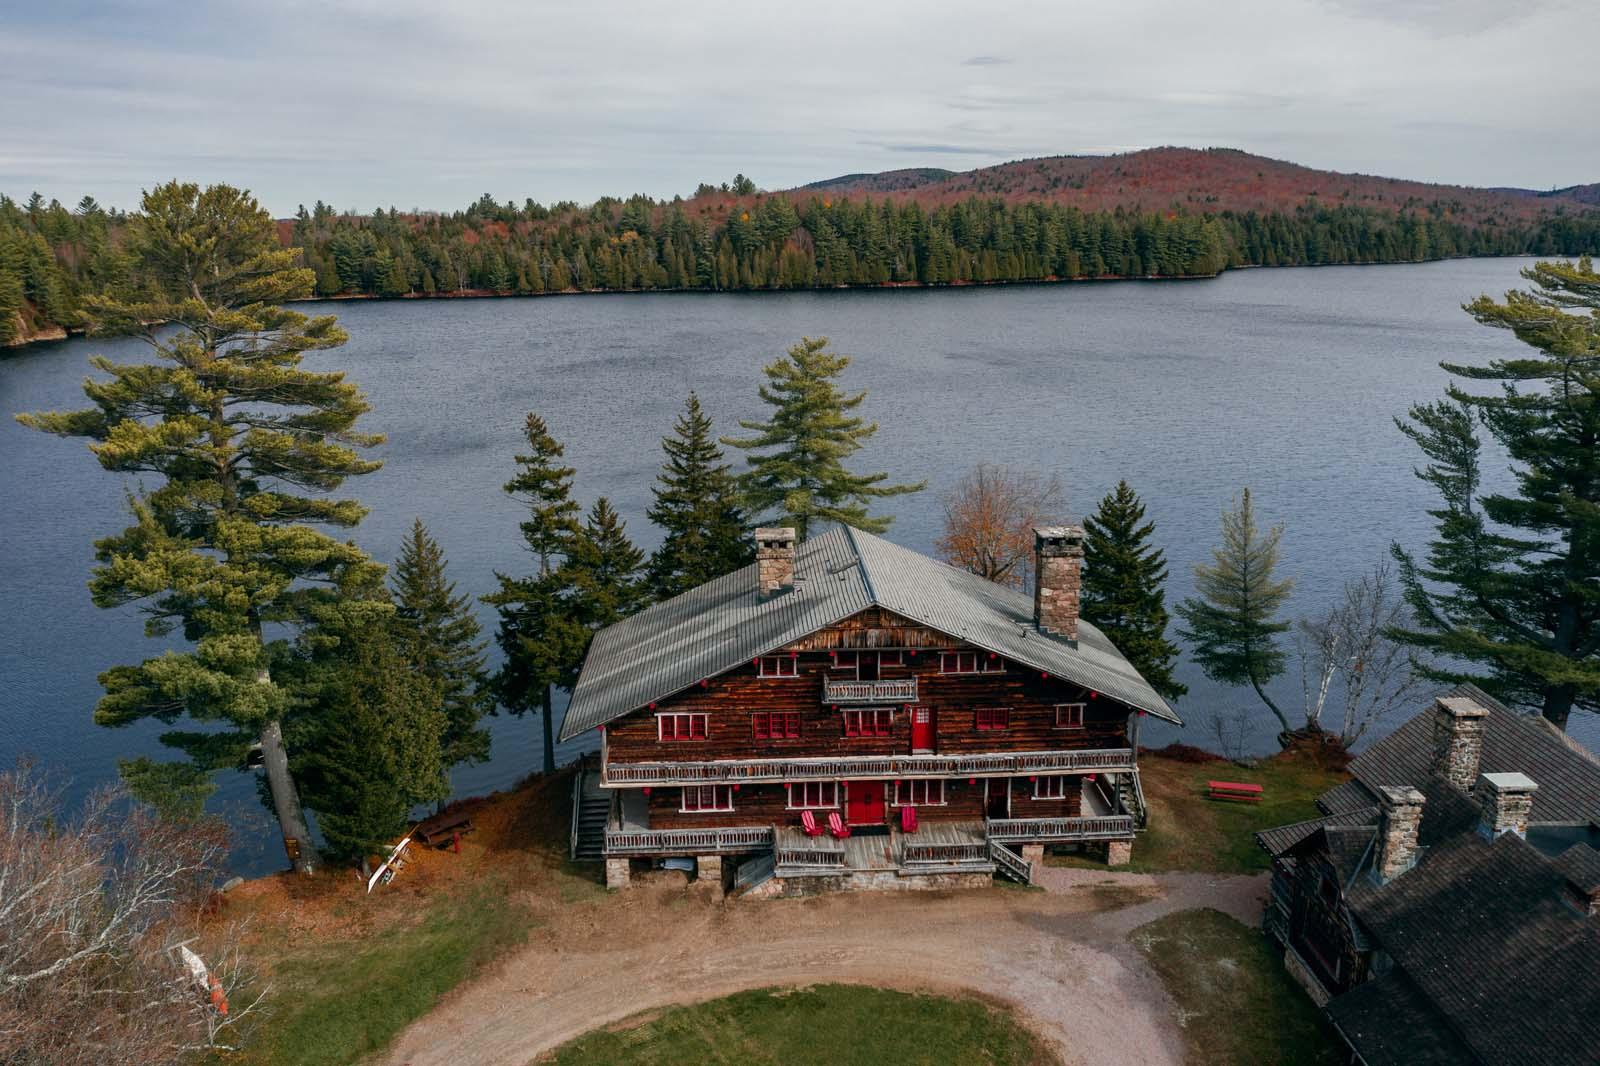 Great Camp Sagamore in the Adirondacks mountain region in Upstate New York